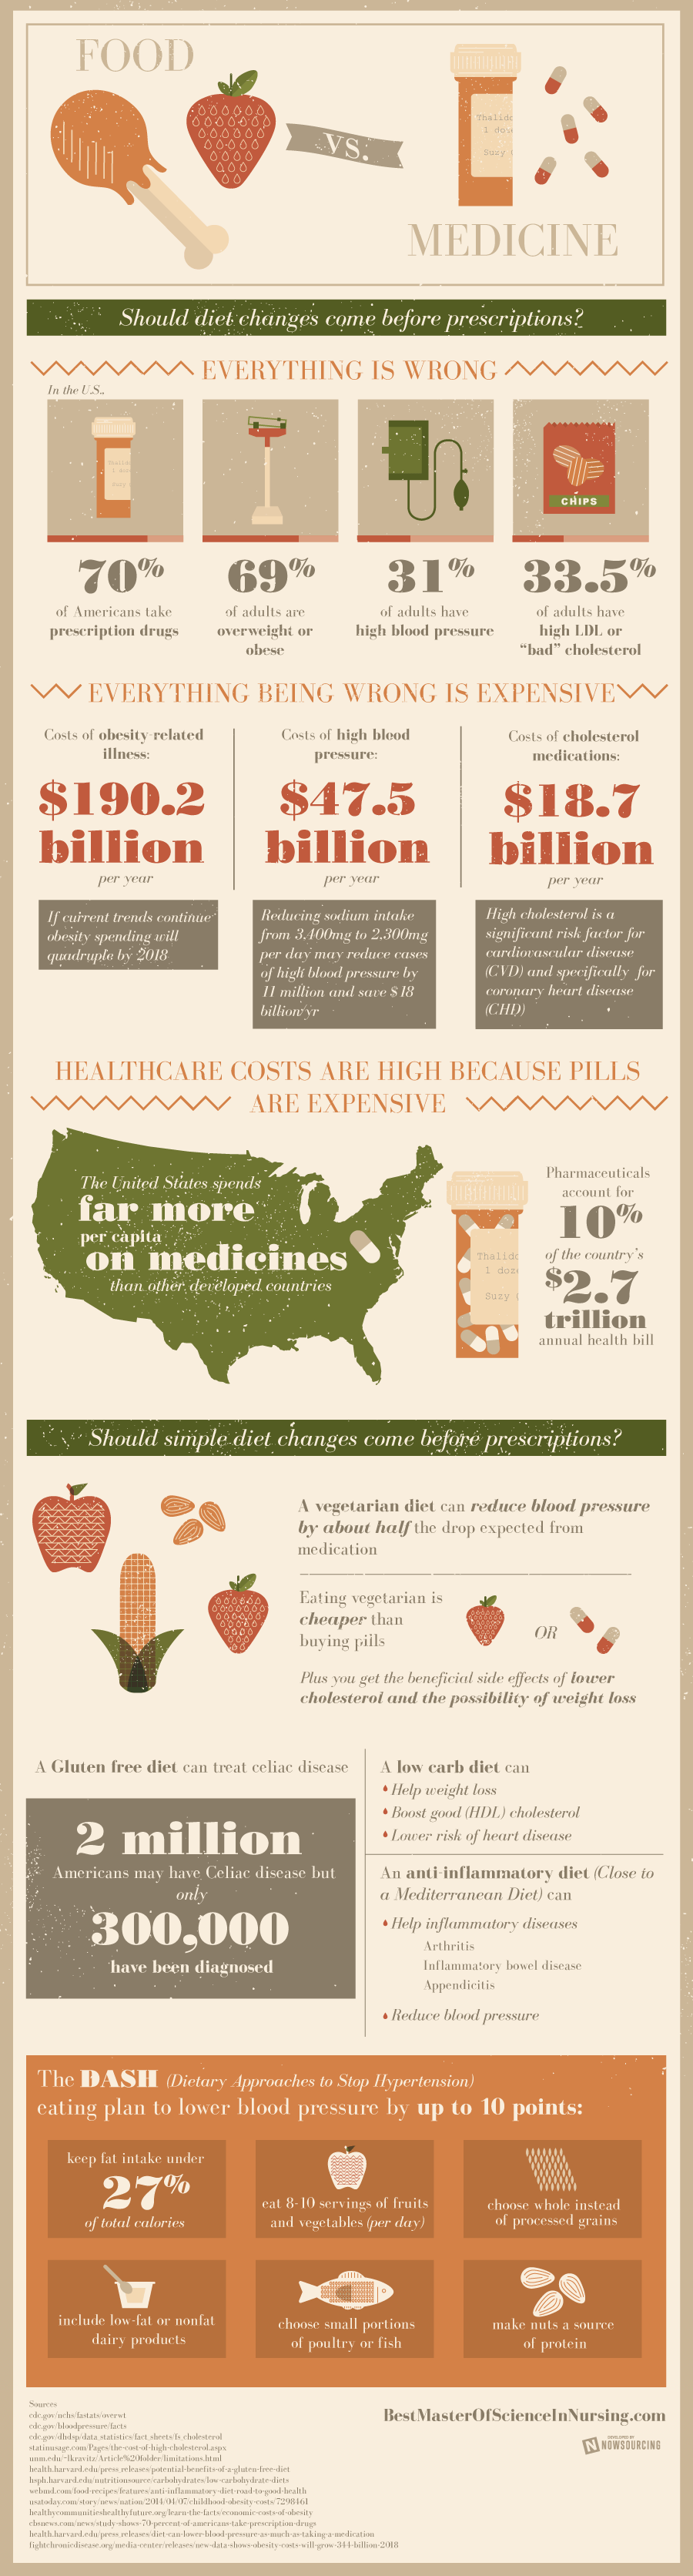 Food vs. Medicine